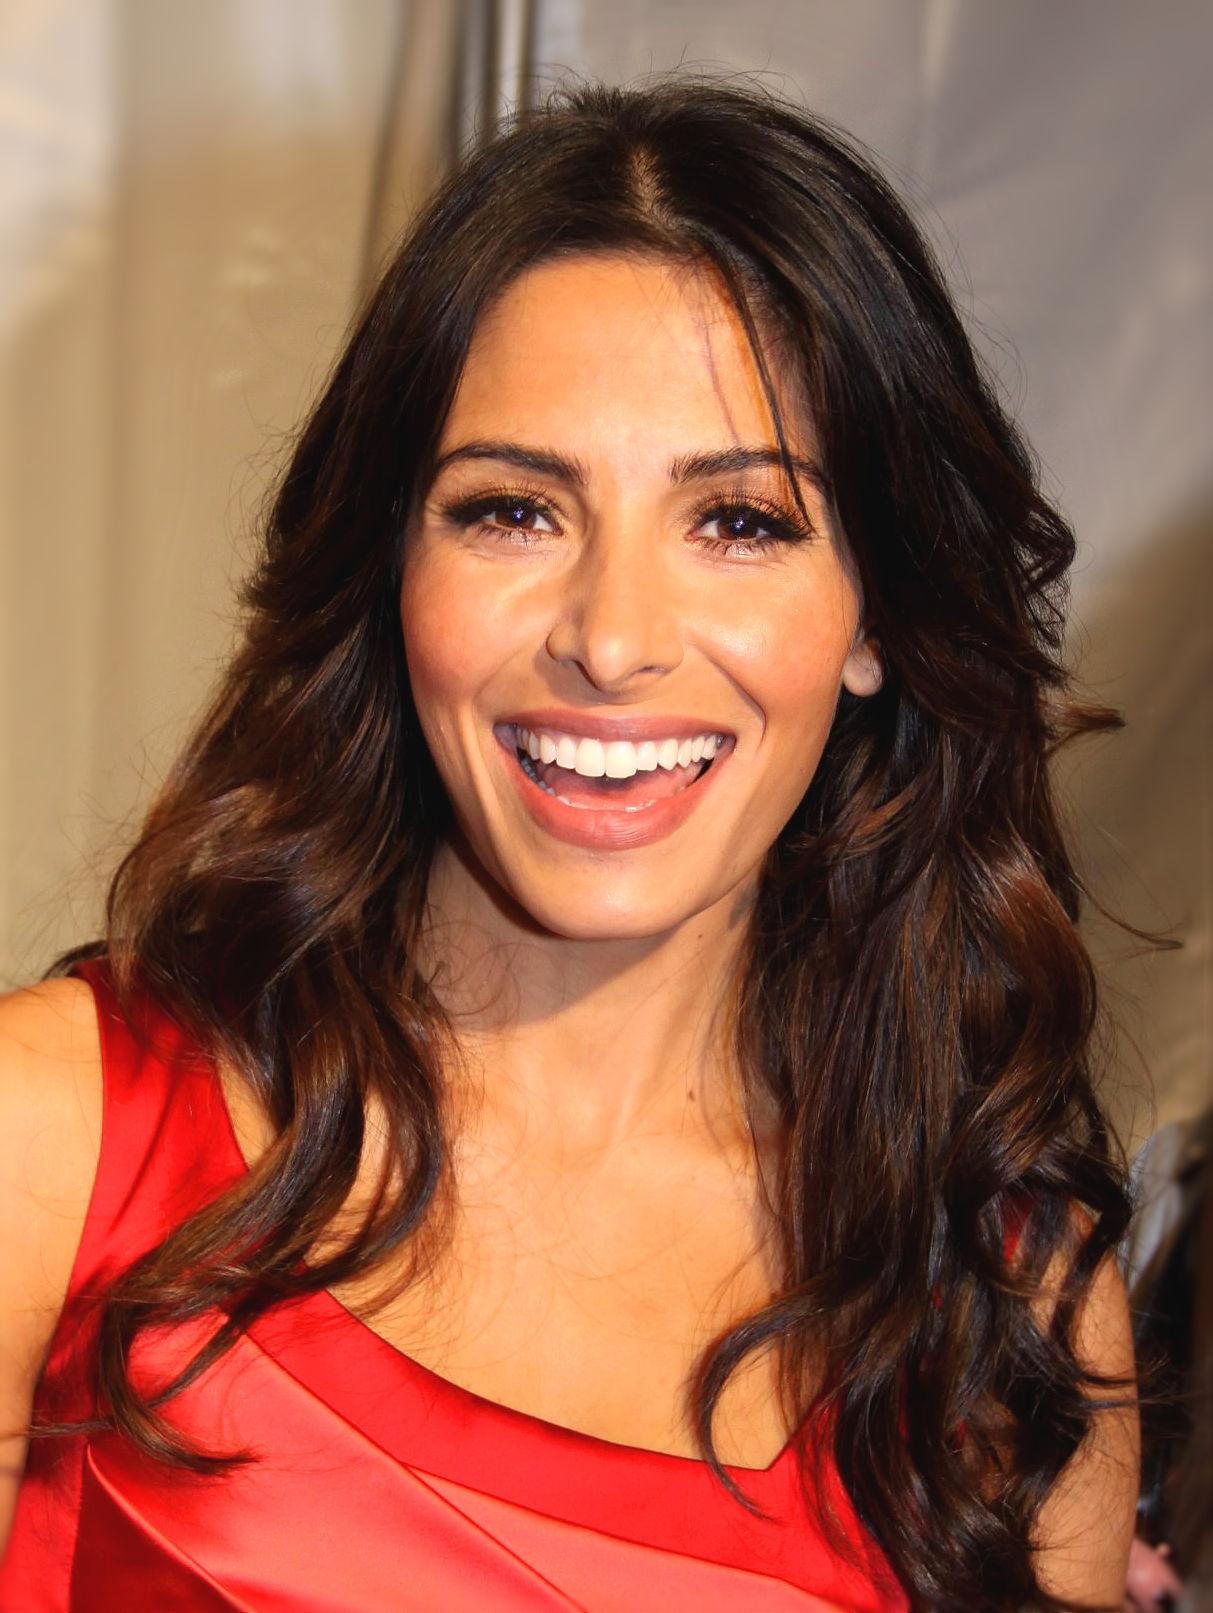 Photo of Sarah Shahi: American television actress and former NFL Cheerleader